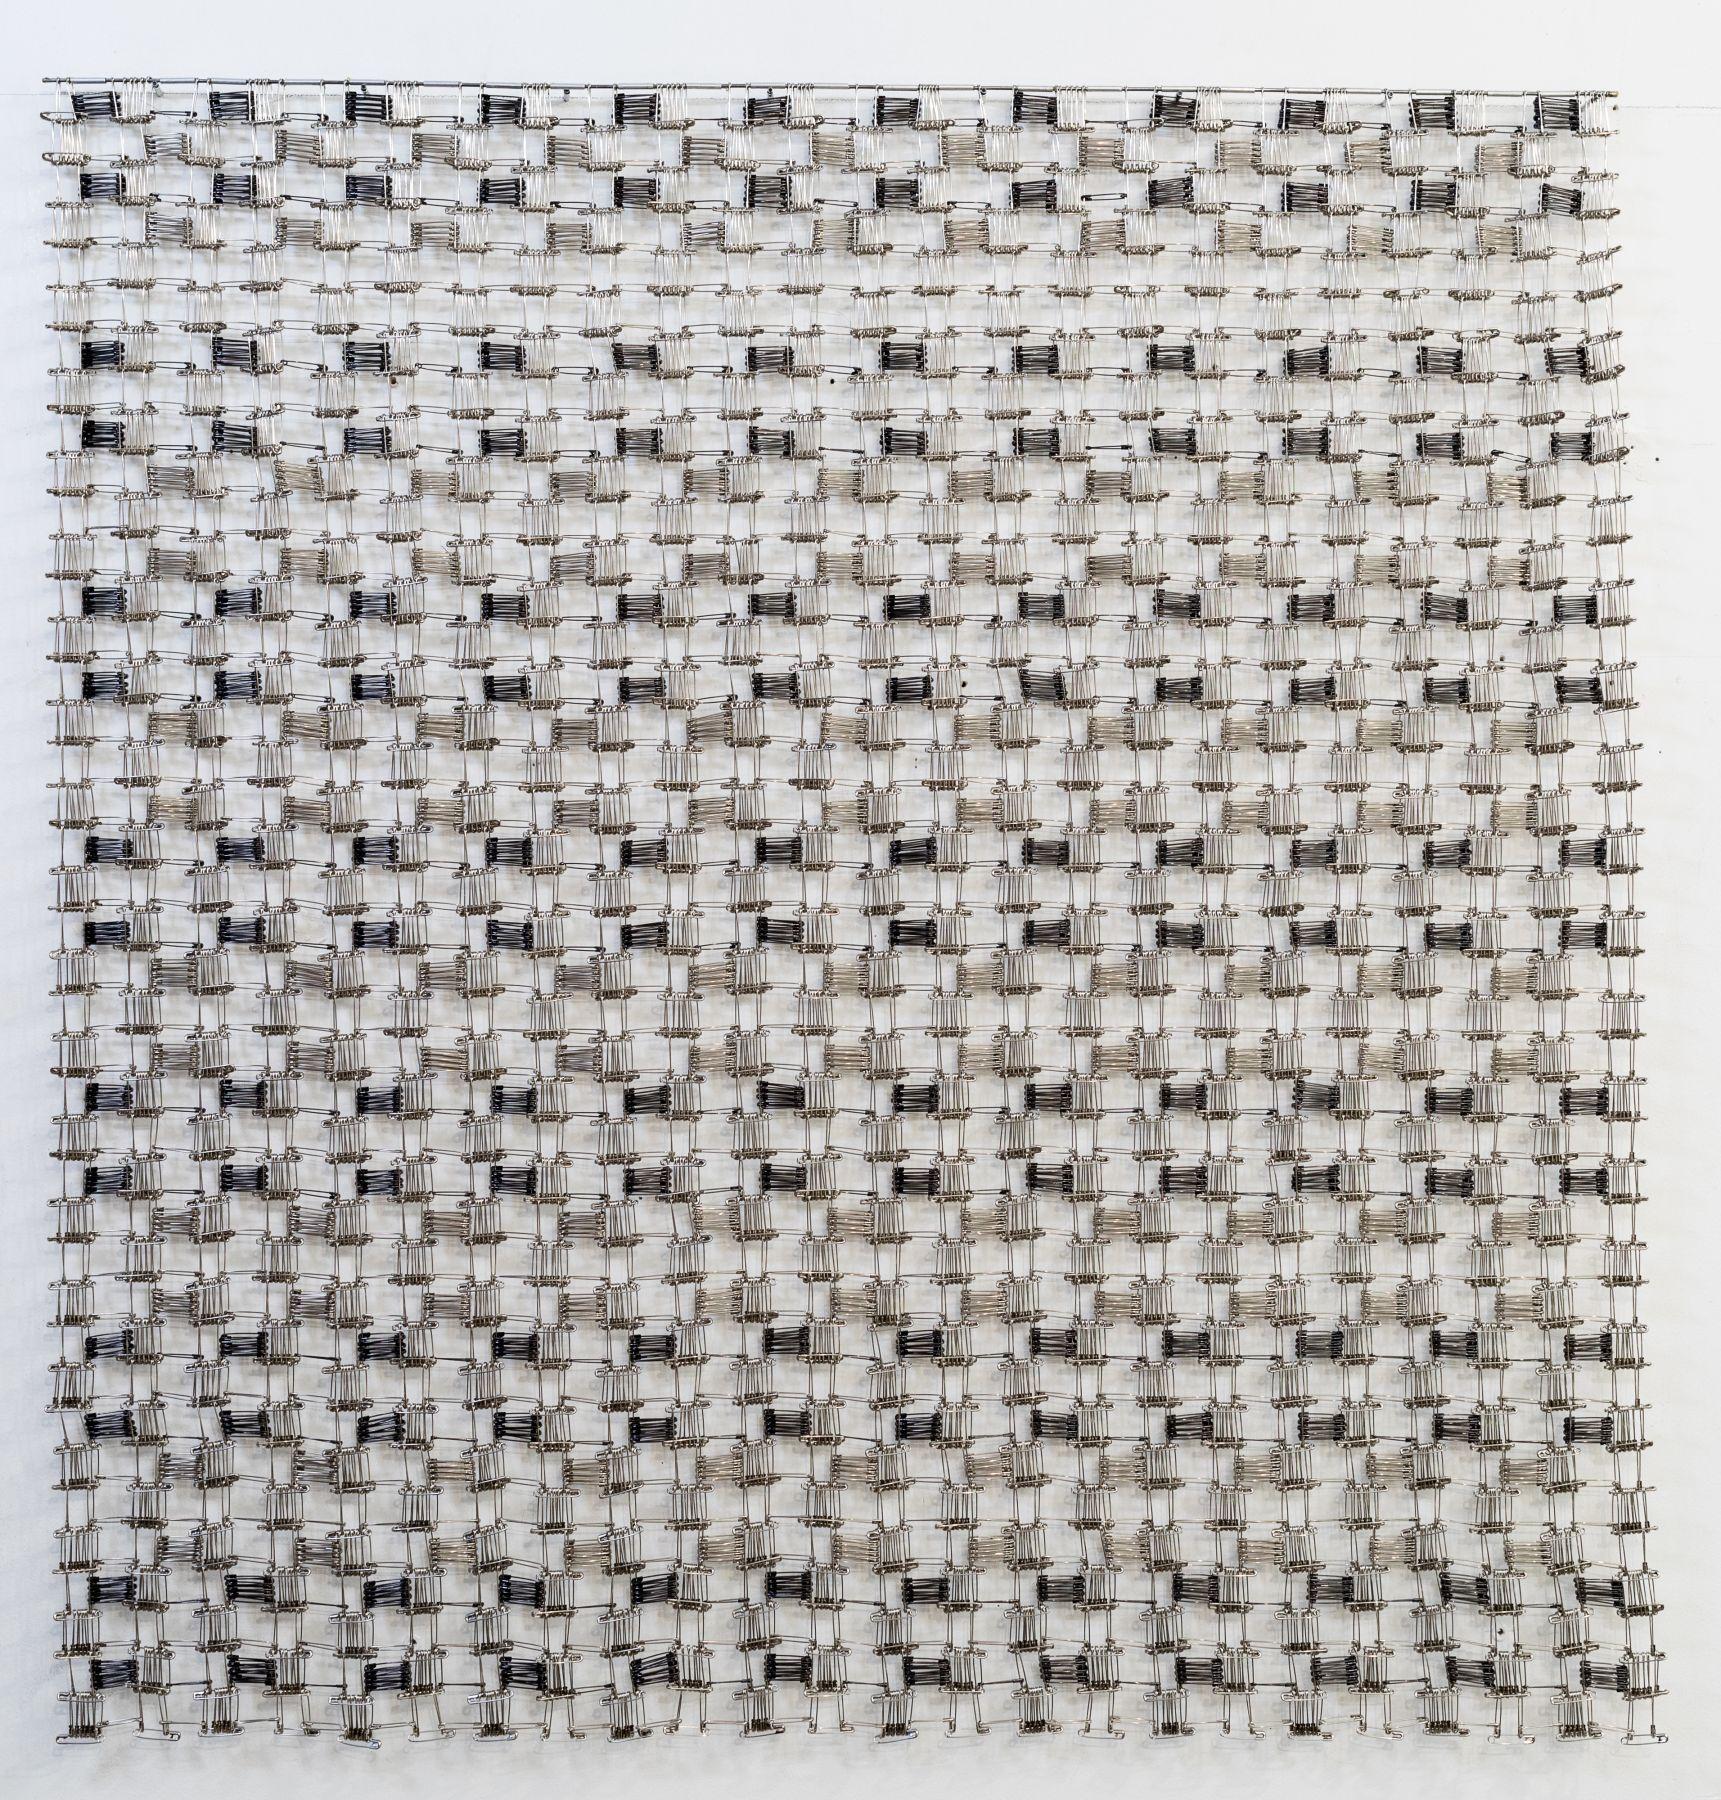 Tamiko Kawata (art)